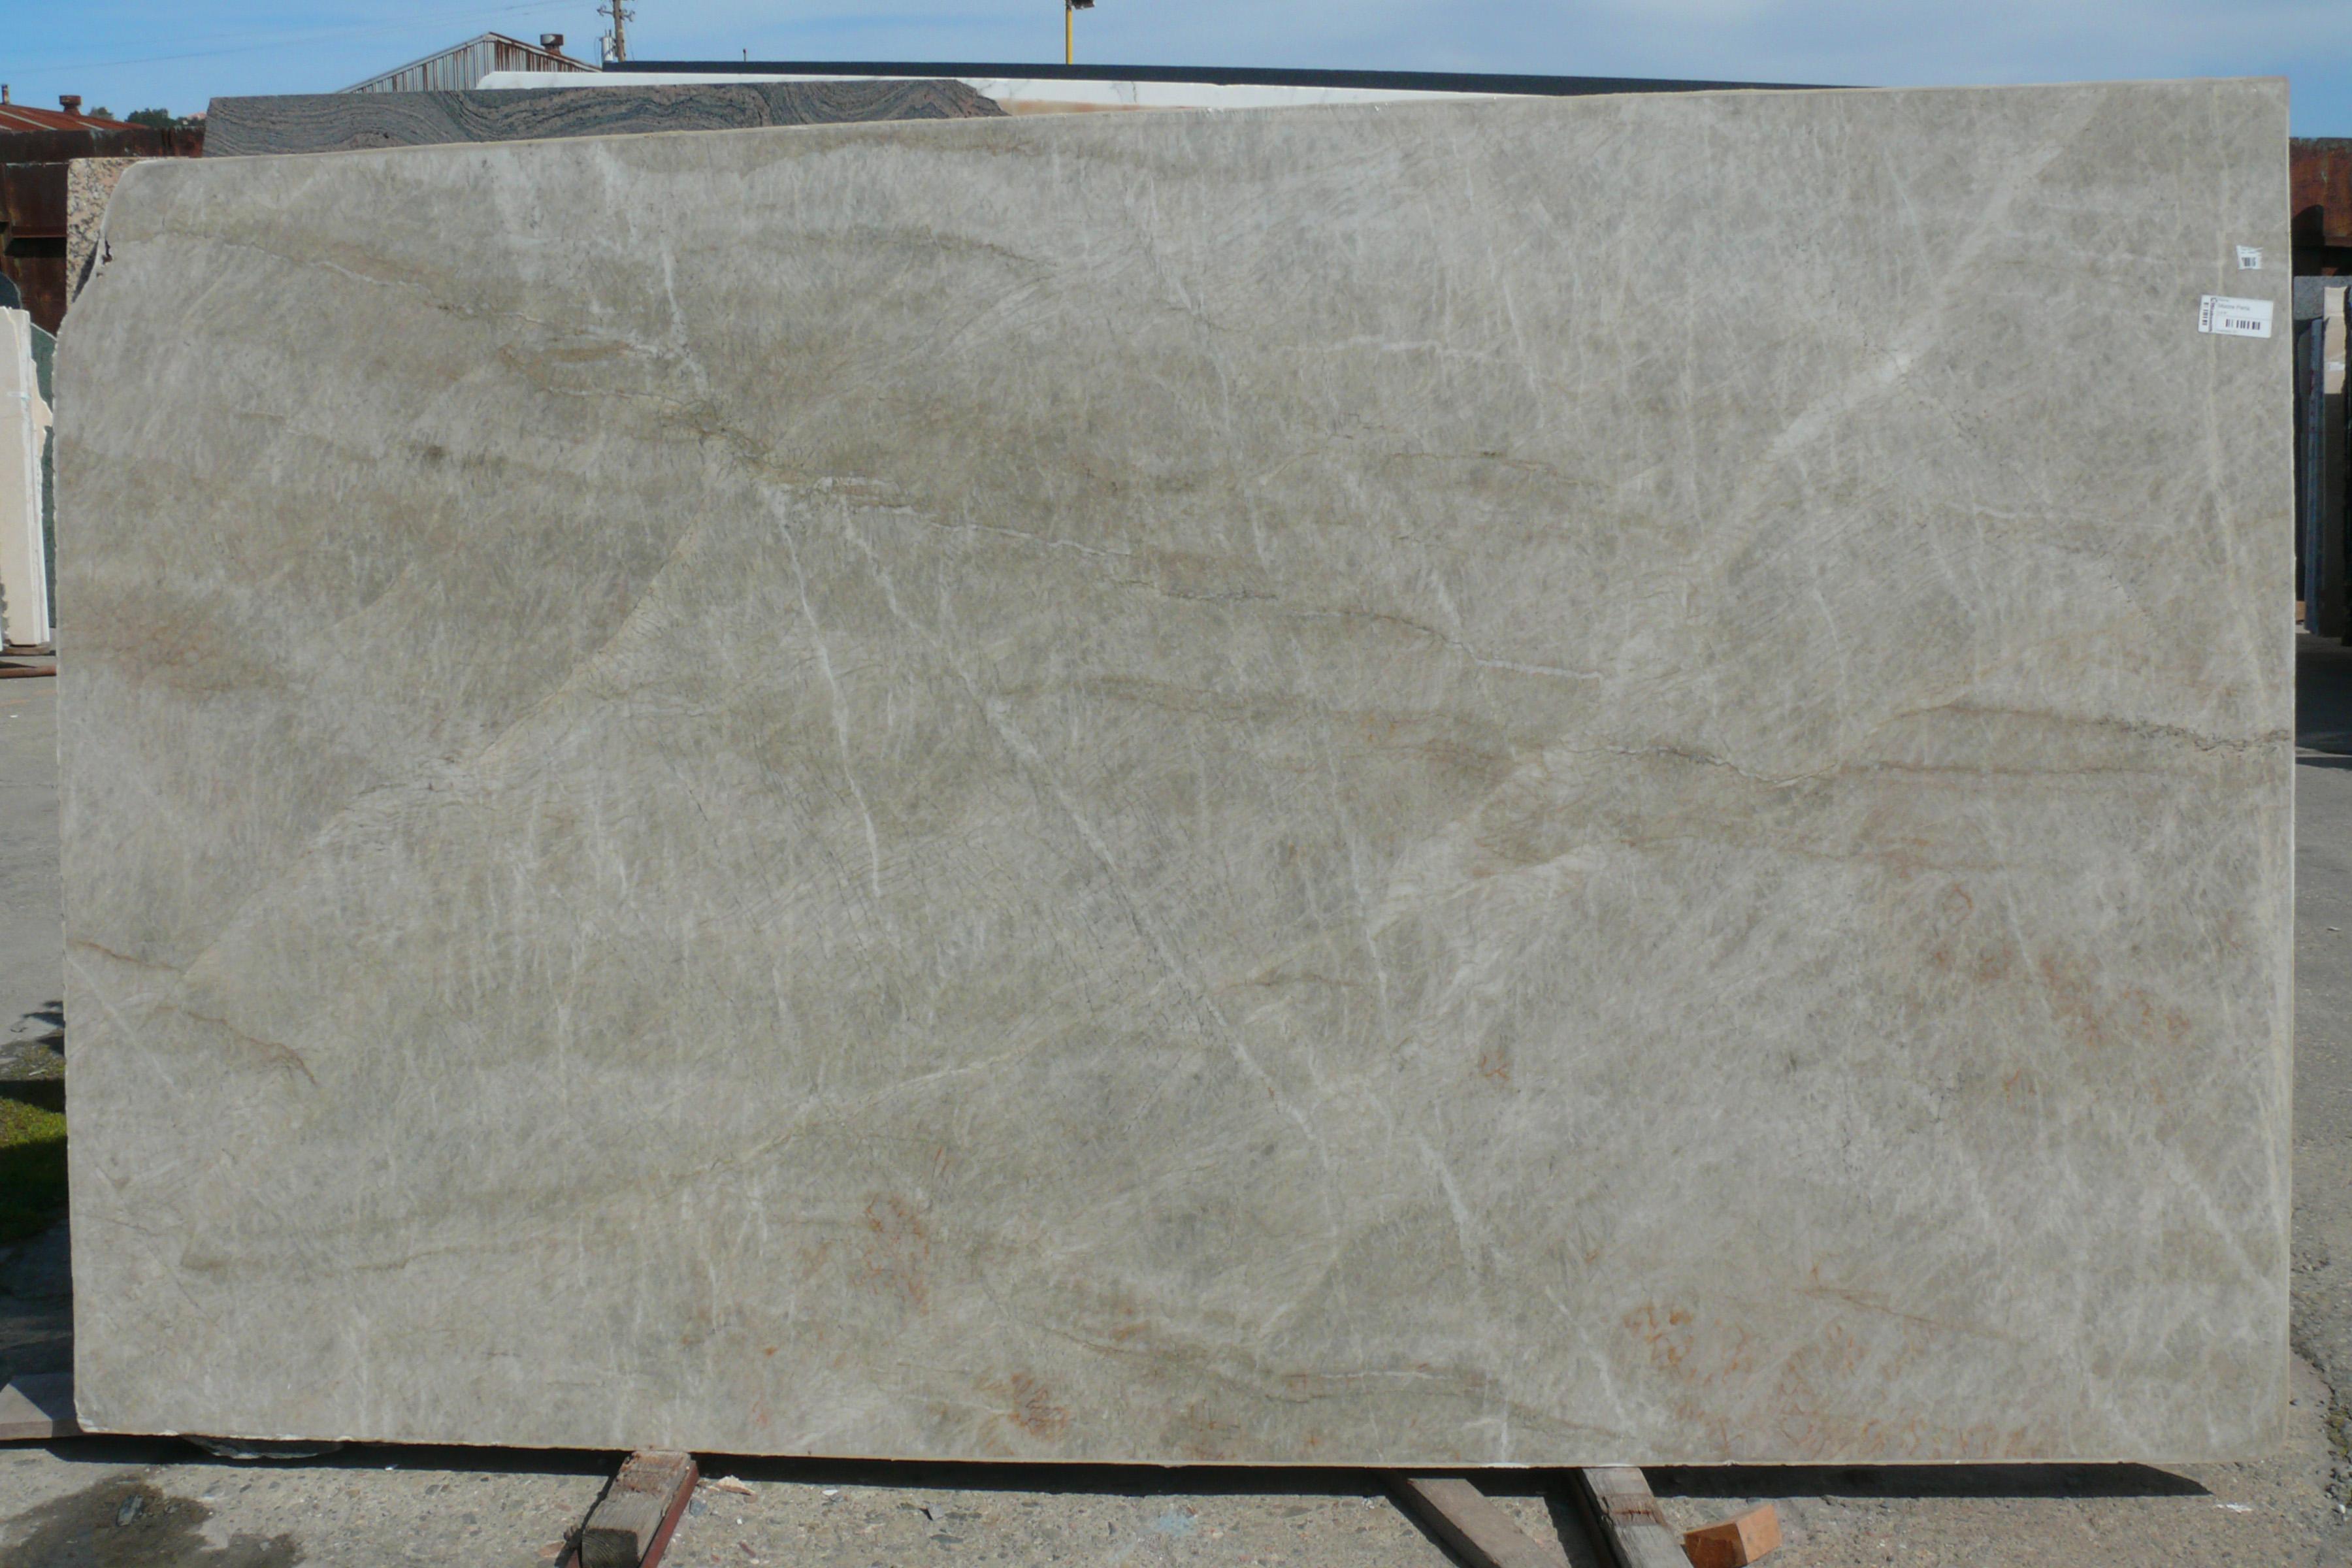 Madre Pearla Quartzite Slab Grey Polished Brazil Fox Marble